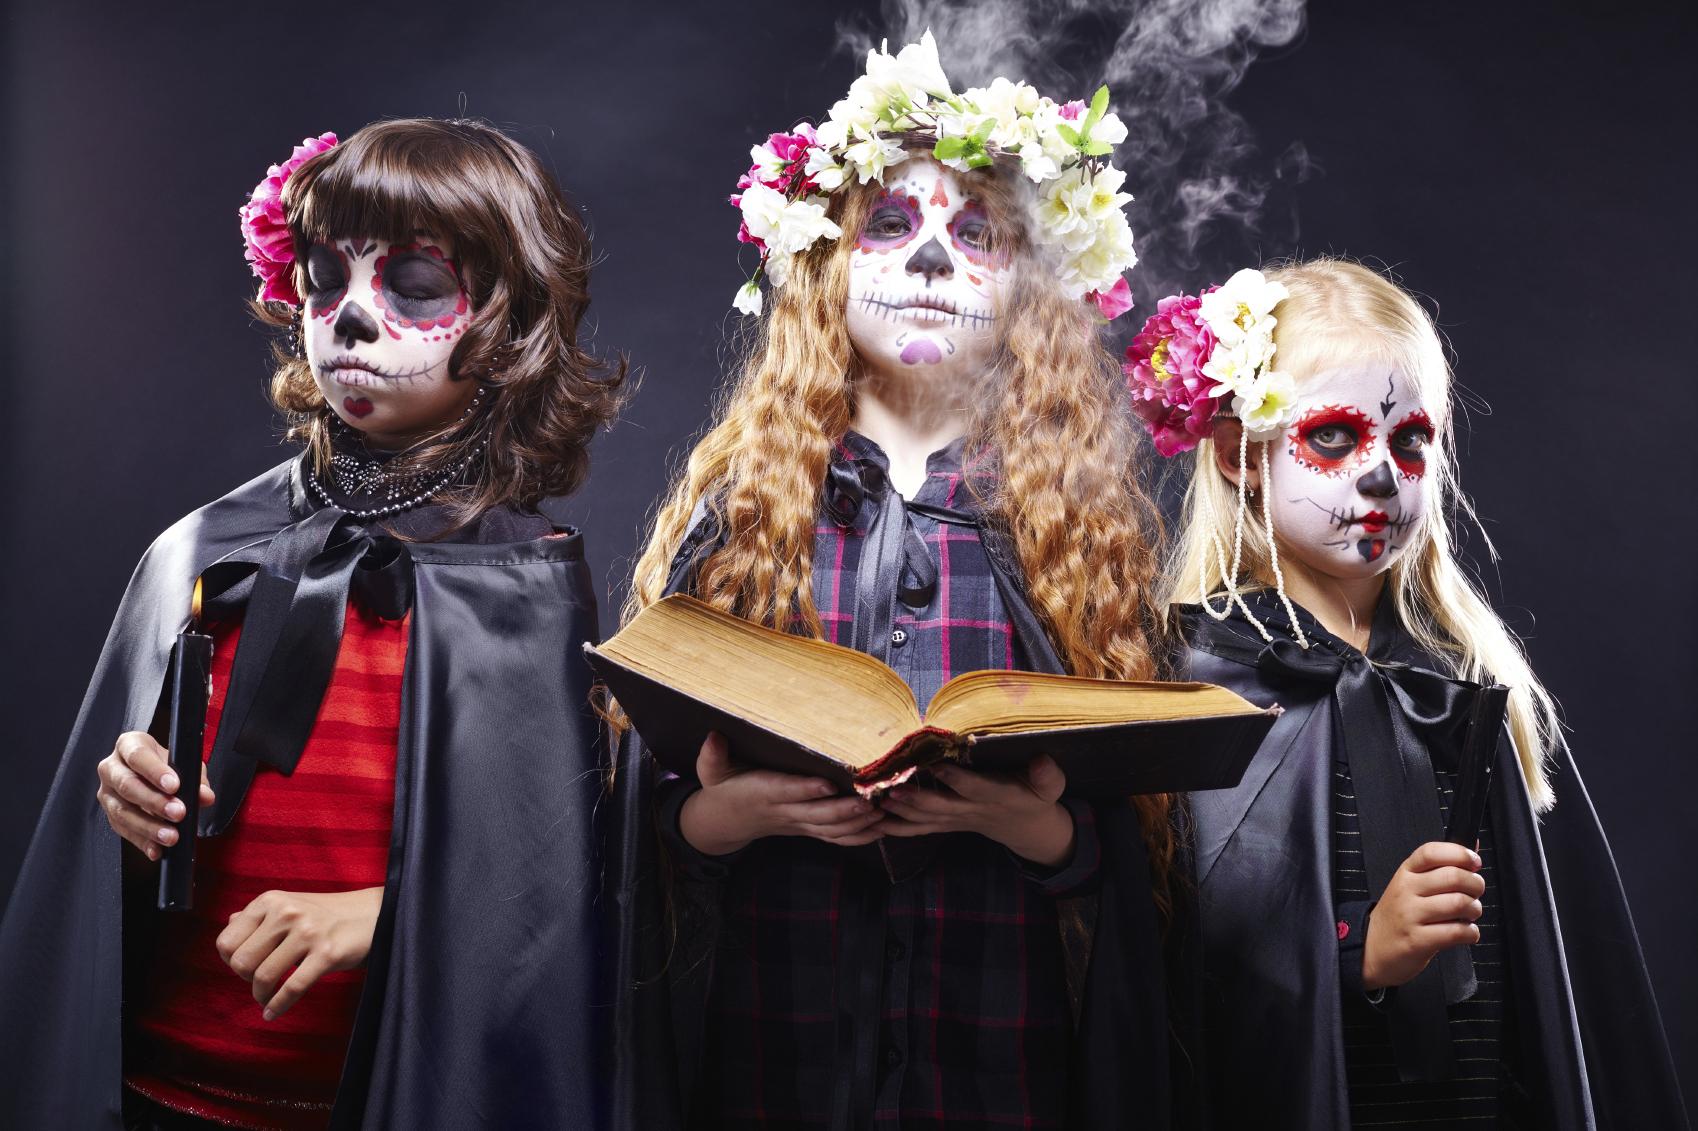 Immagini di trucco di Halloween per bambini - PianetaMamma.it